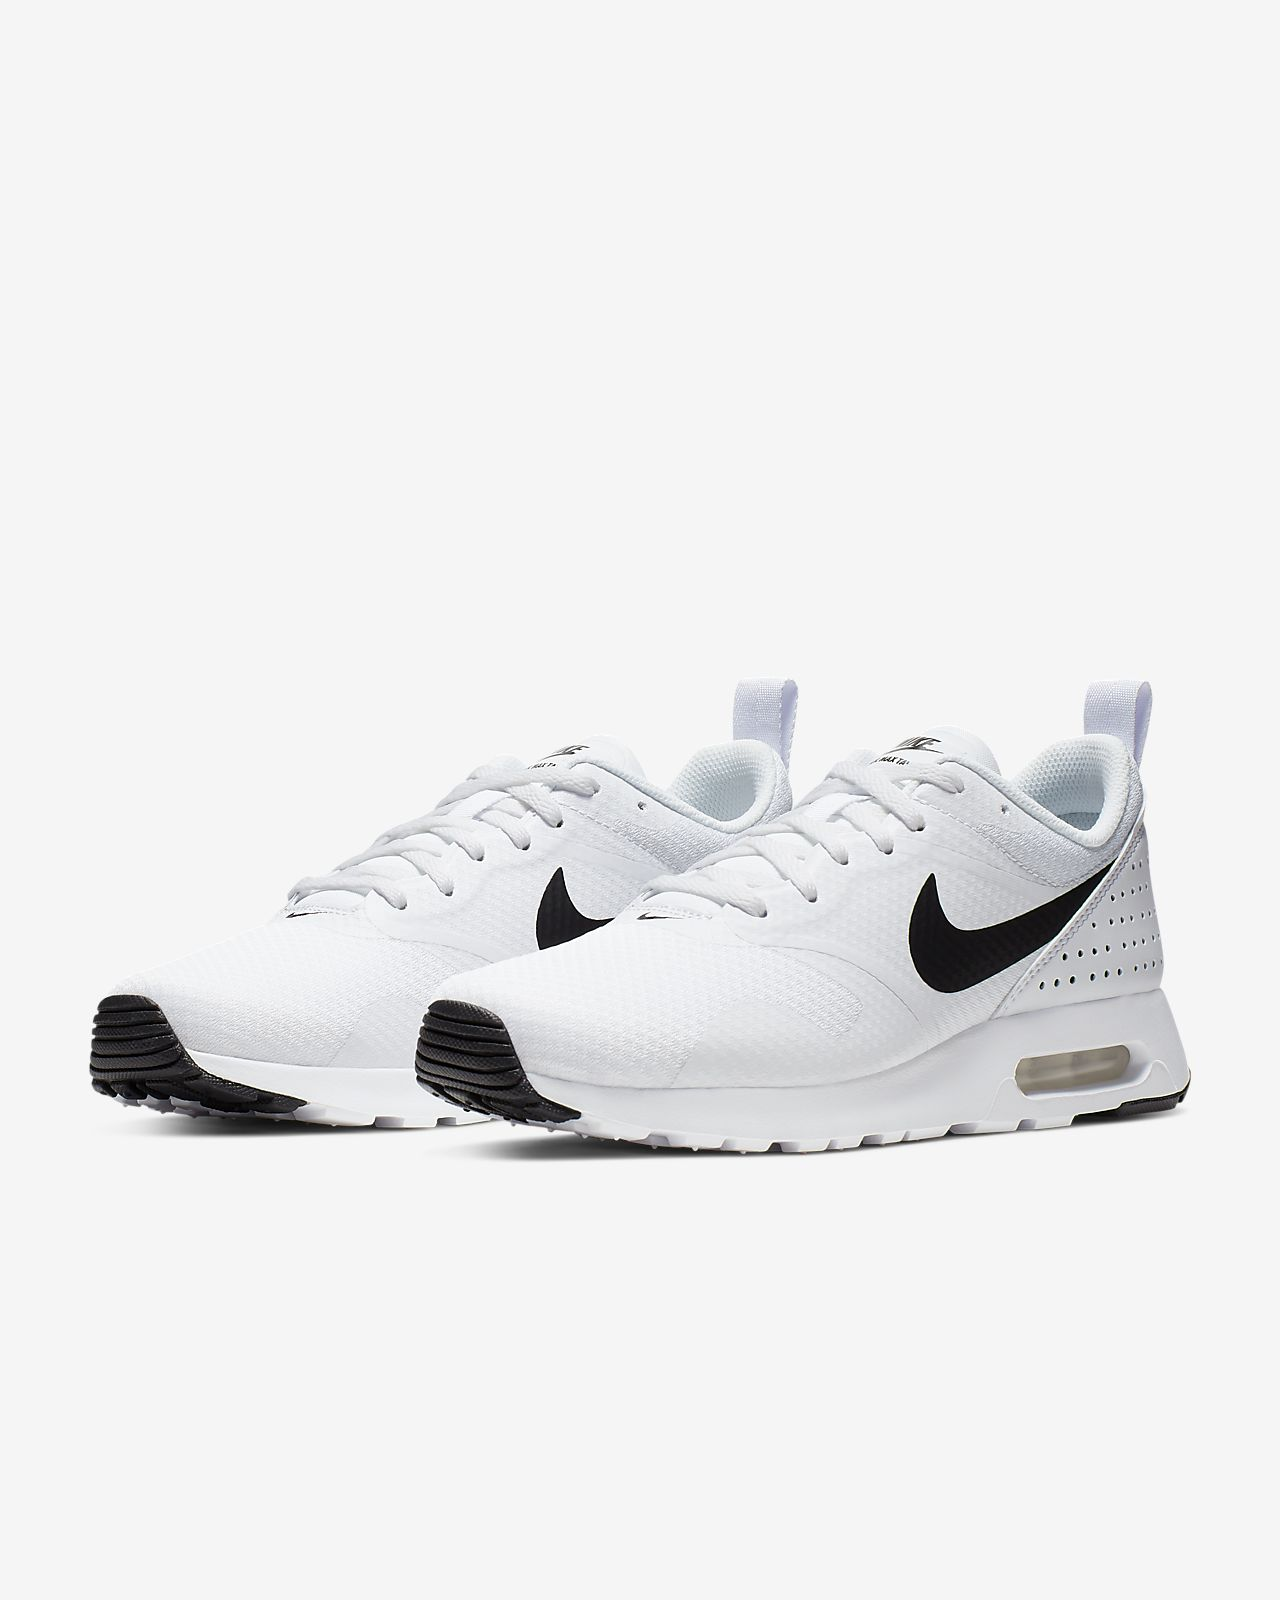 Nike Air Max Tavas Women's Shoe